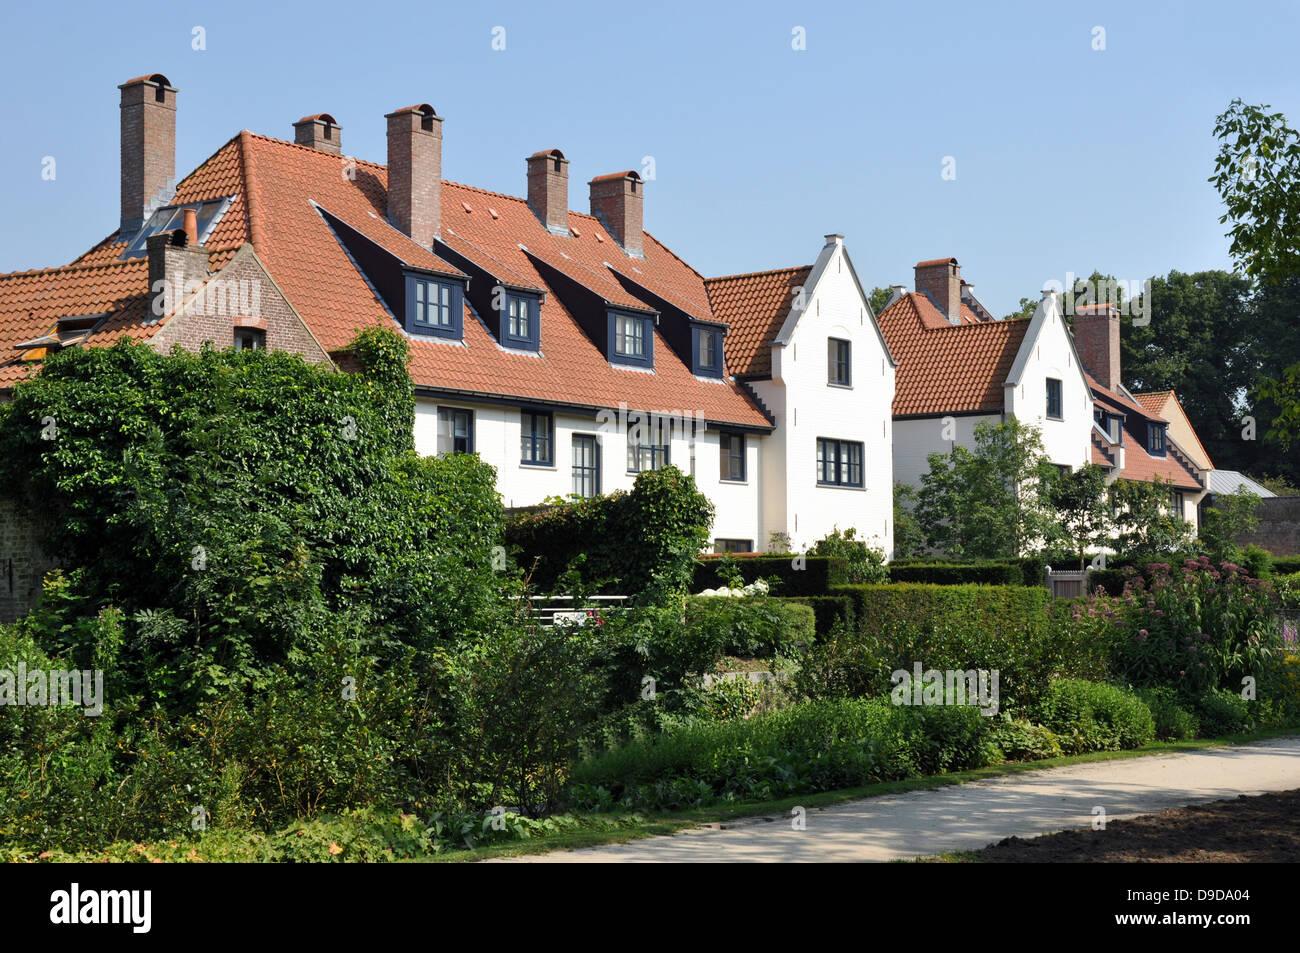 Modern Houses Stockfotos & Modern Houses Bilder - Alamy